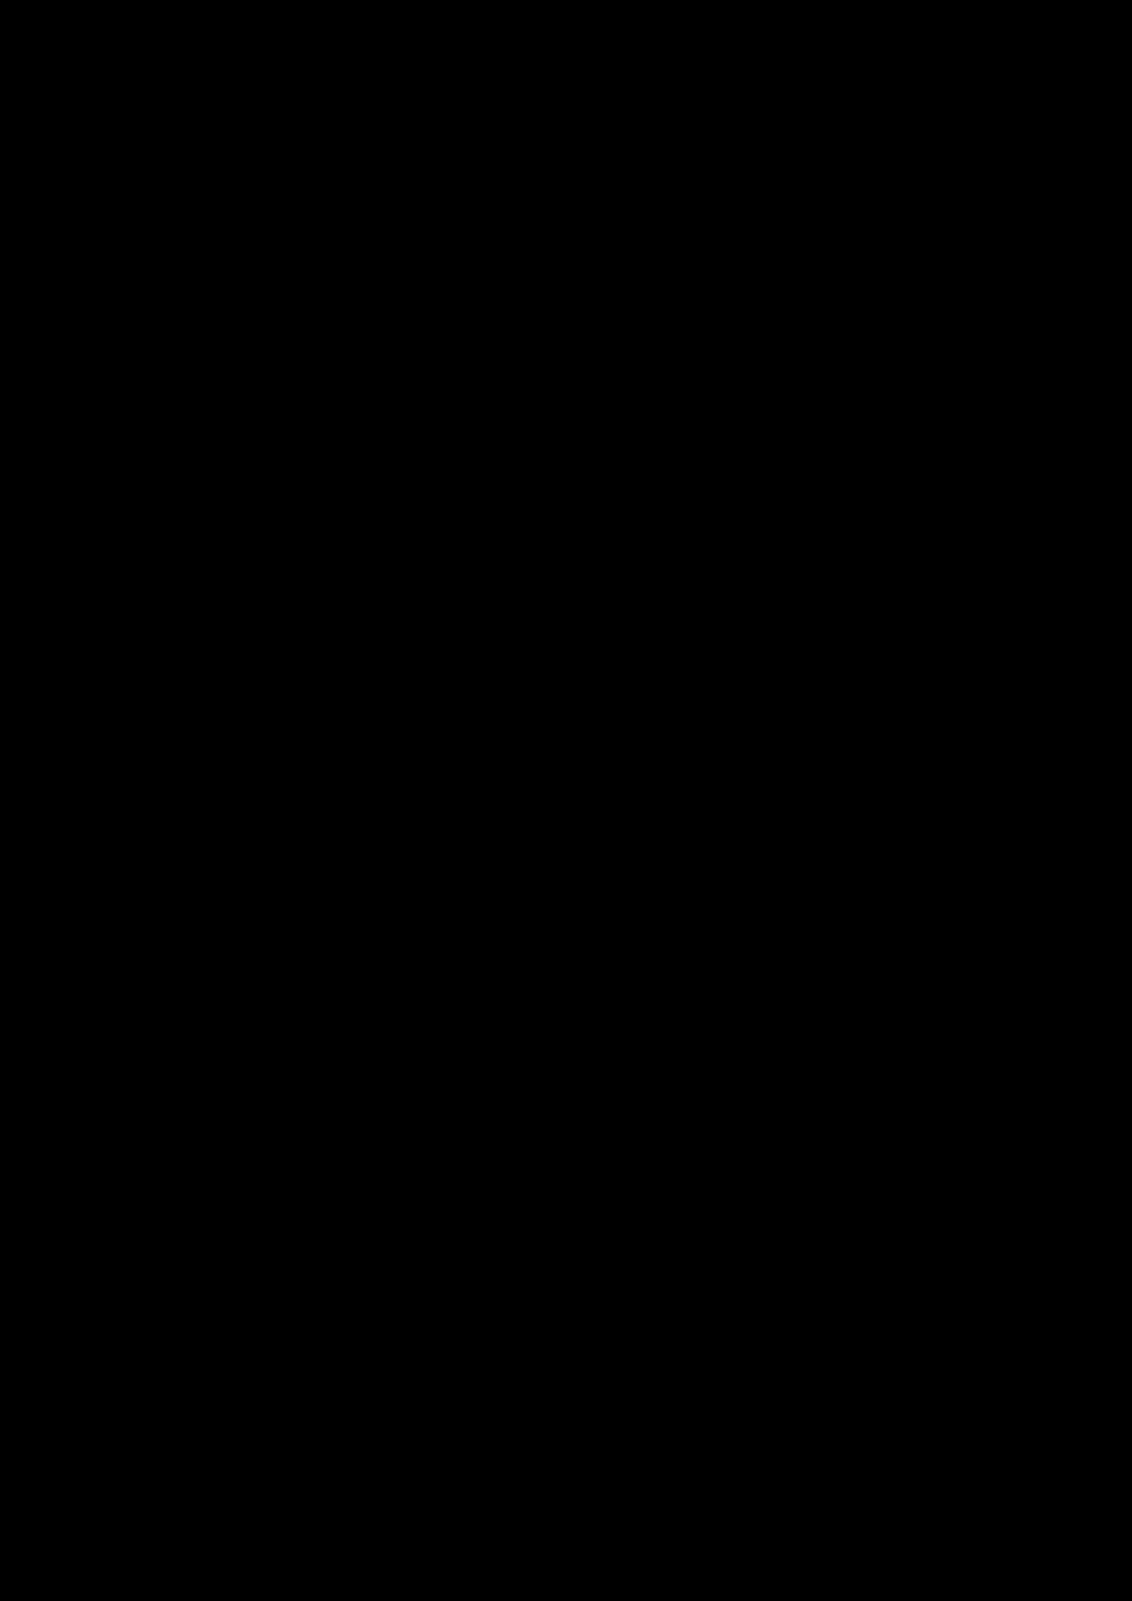 Prosti slide, Image 45